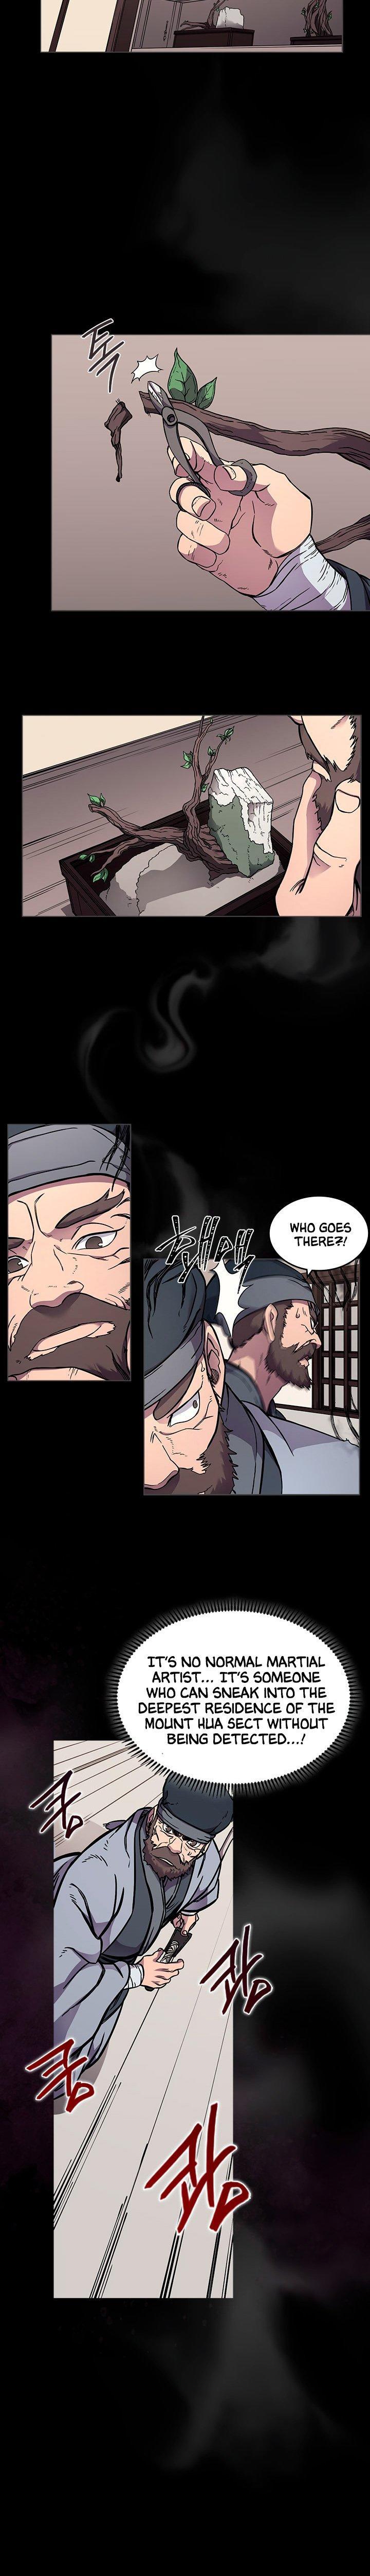 Chronicles Of Heavenly Demon Chapter 133 page 12 - Mangakakalots.com